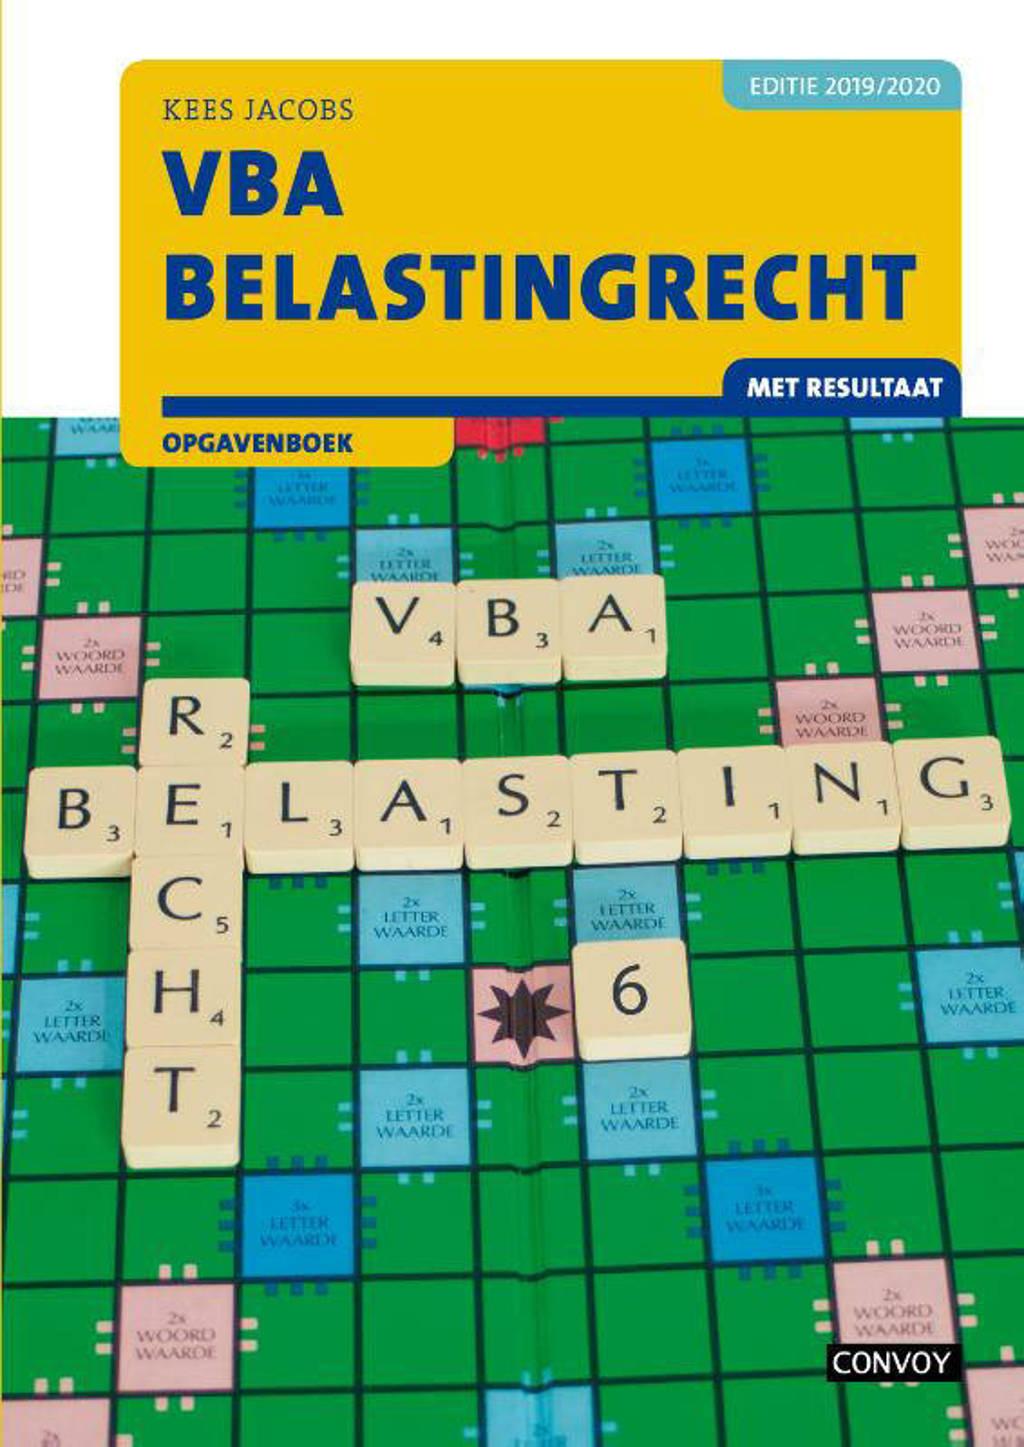 VBA Belastingrecht 2019-2020 Opgavenboek - C.J.M. Jacobs